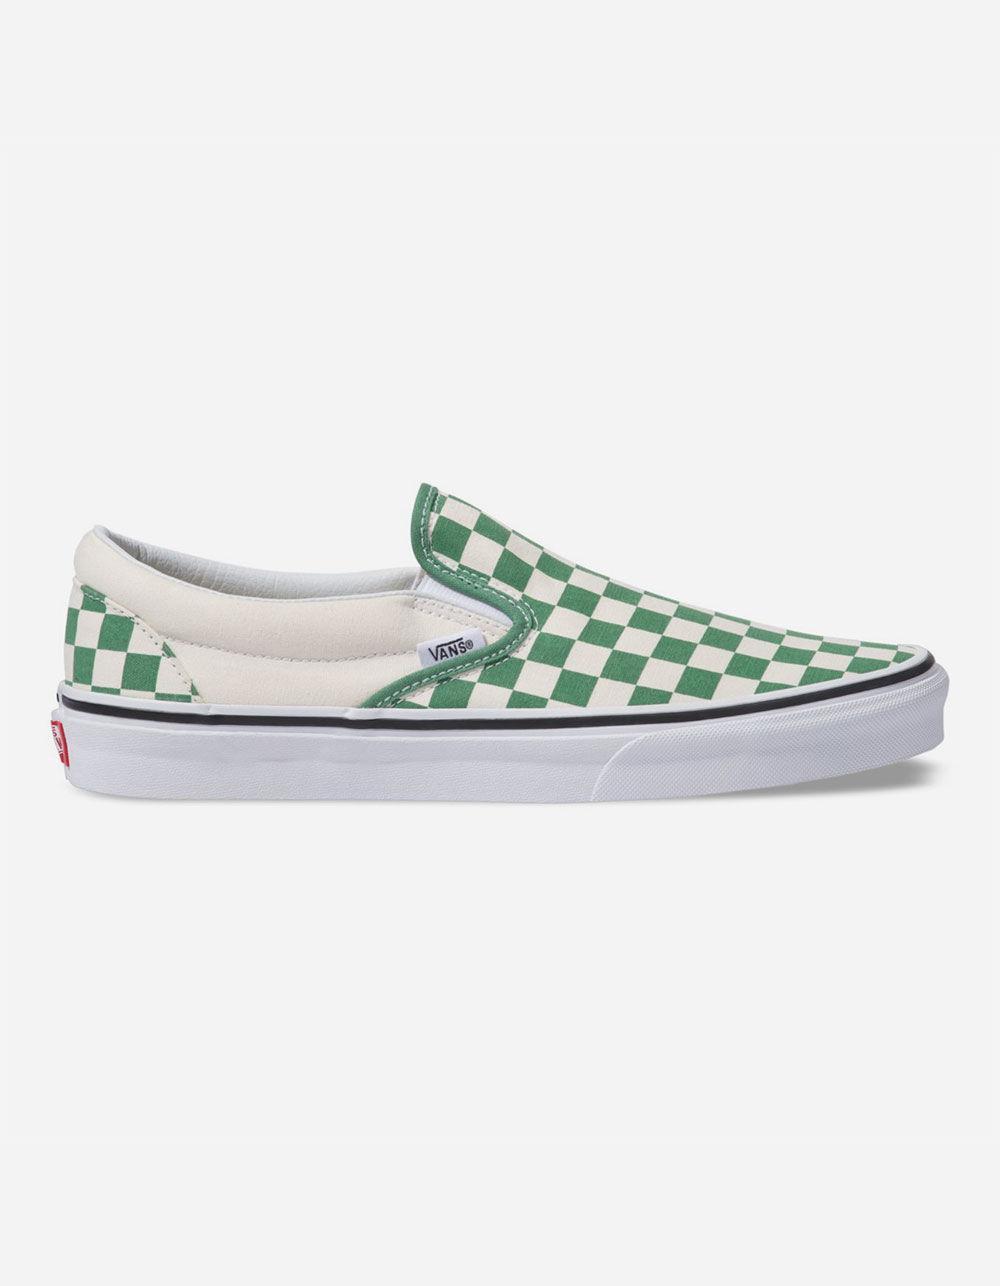 3bdceafd835c4f Vans - Classic Slip-on Deep Grass Green Shoes for Men - Lyst. View  fullscreen